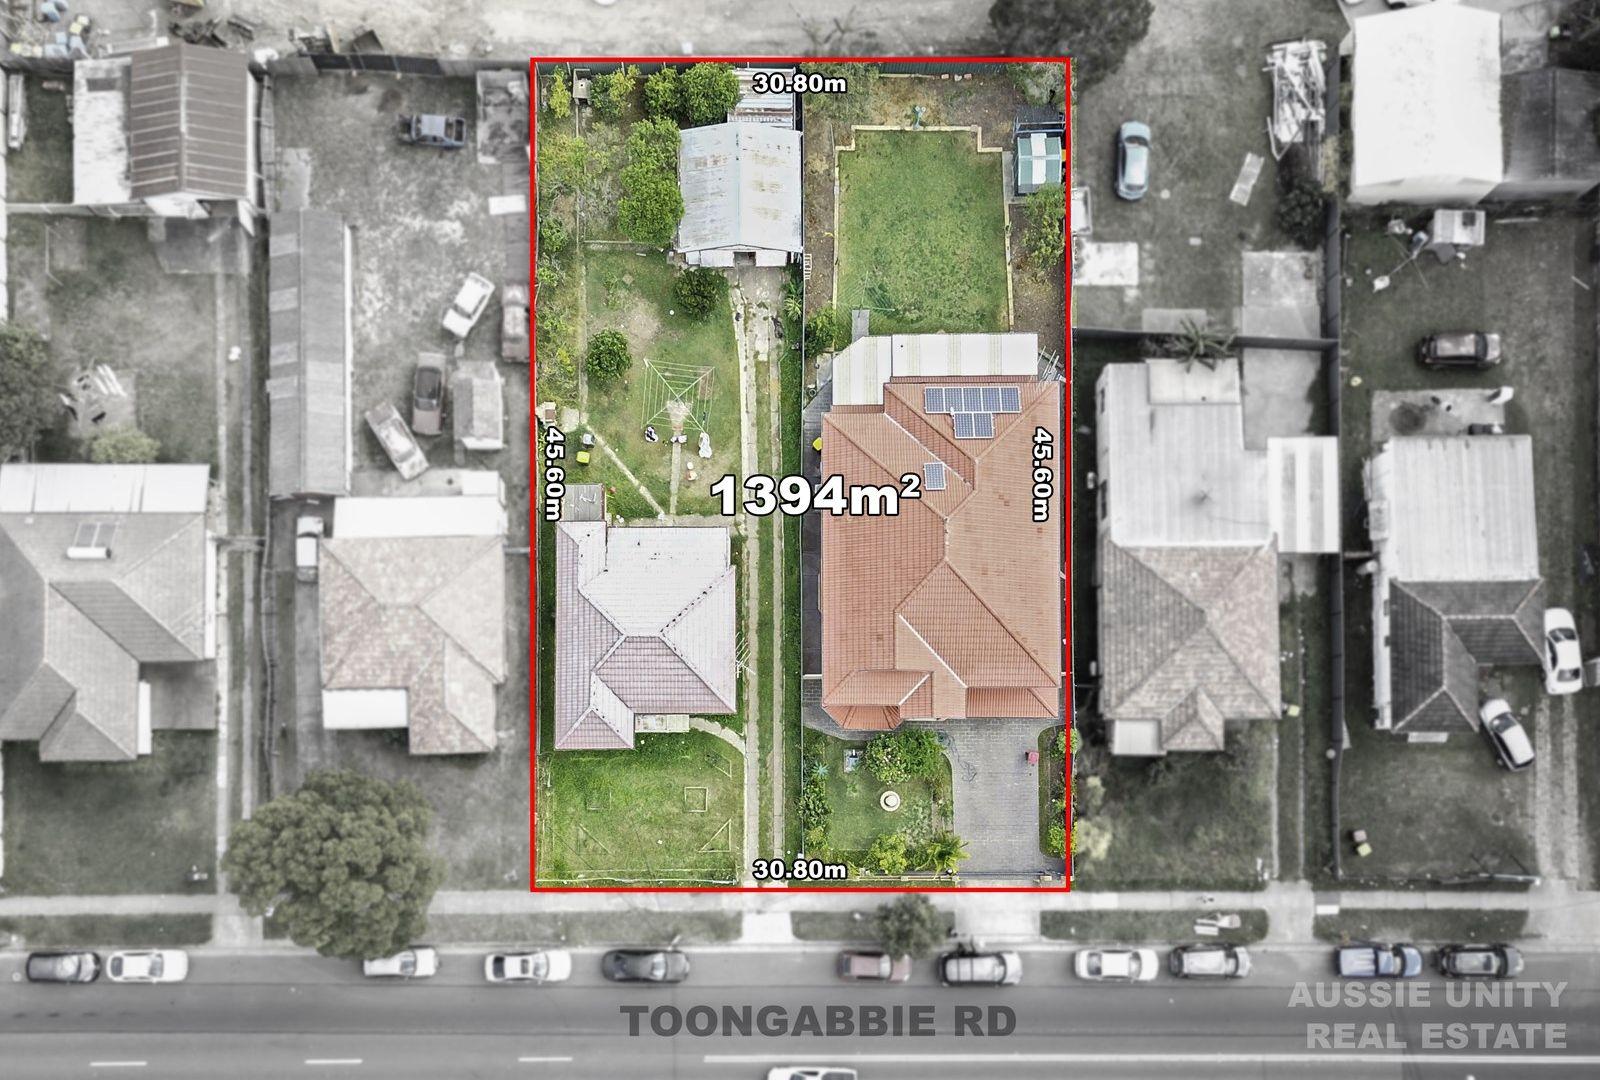 27-29 Toongabbie Rd, Toongabbie NSW 2146, Image 1